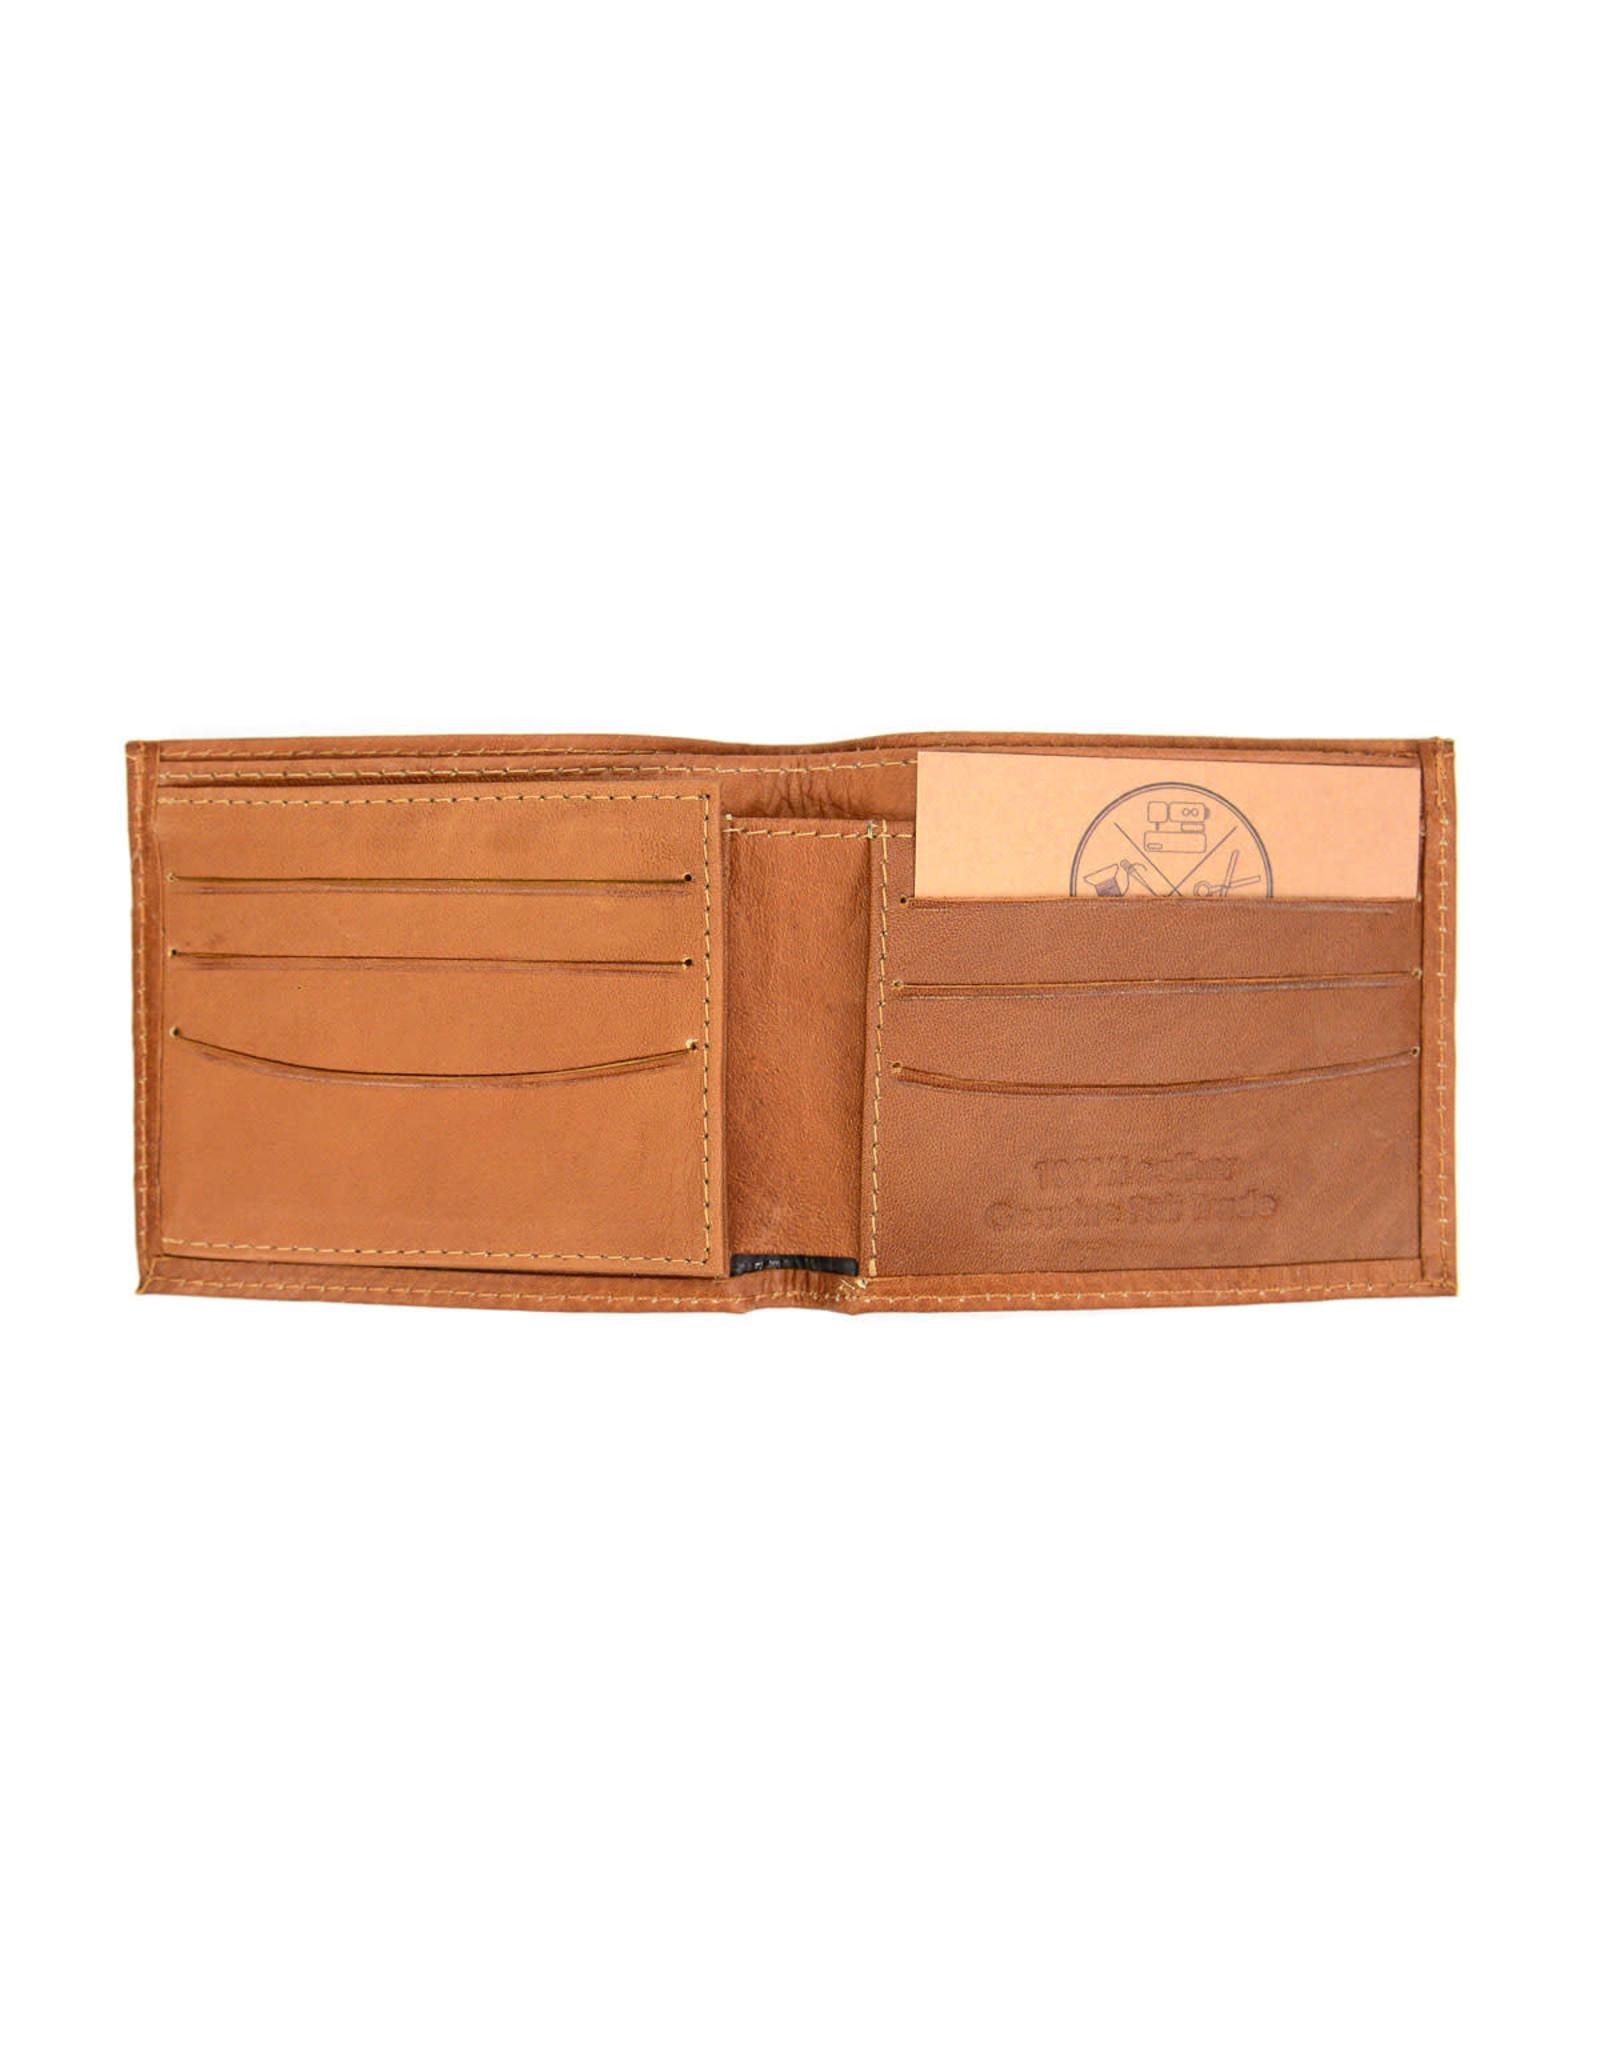 Minga Leather Bifold Wallet, Ecuador